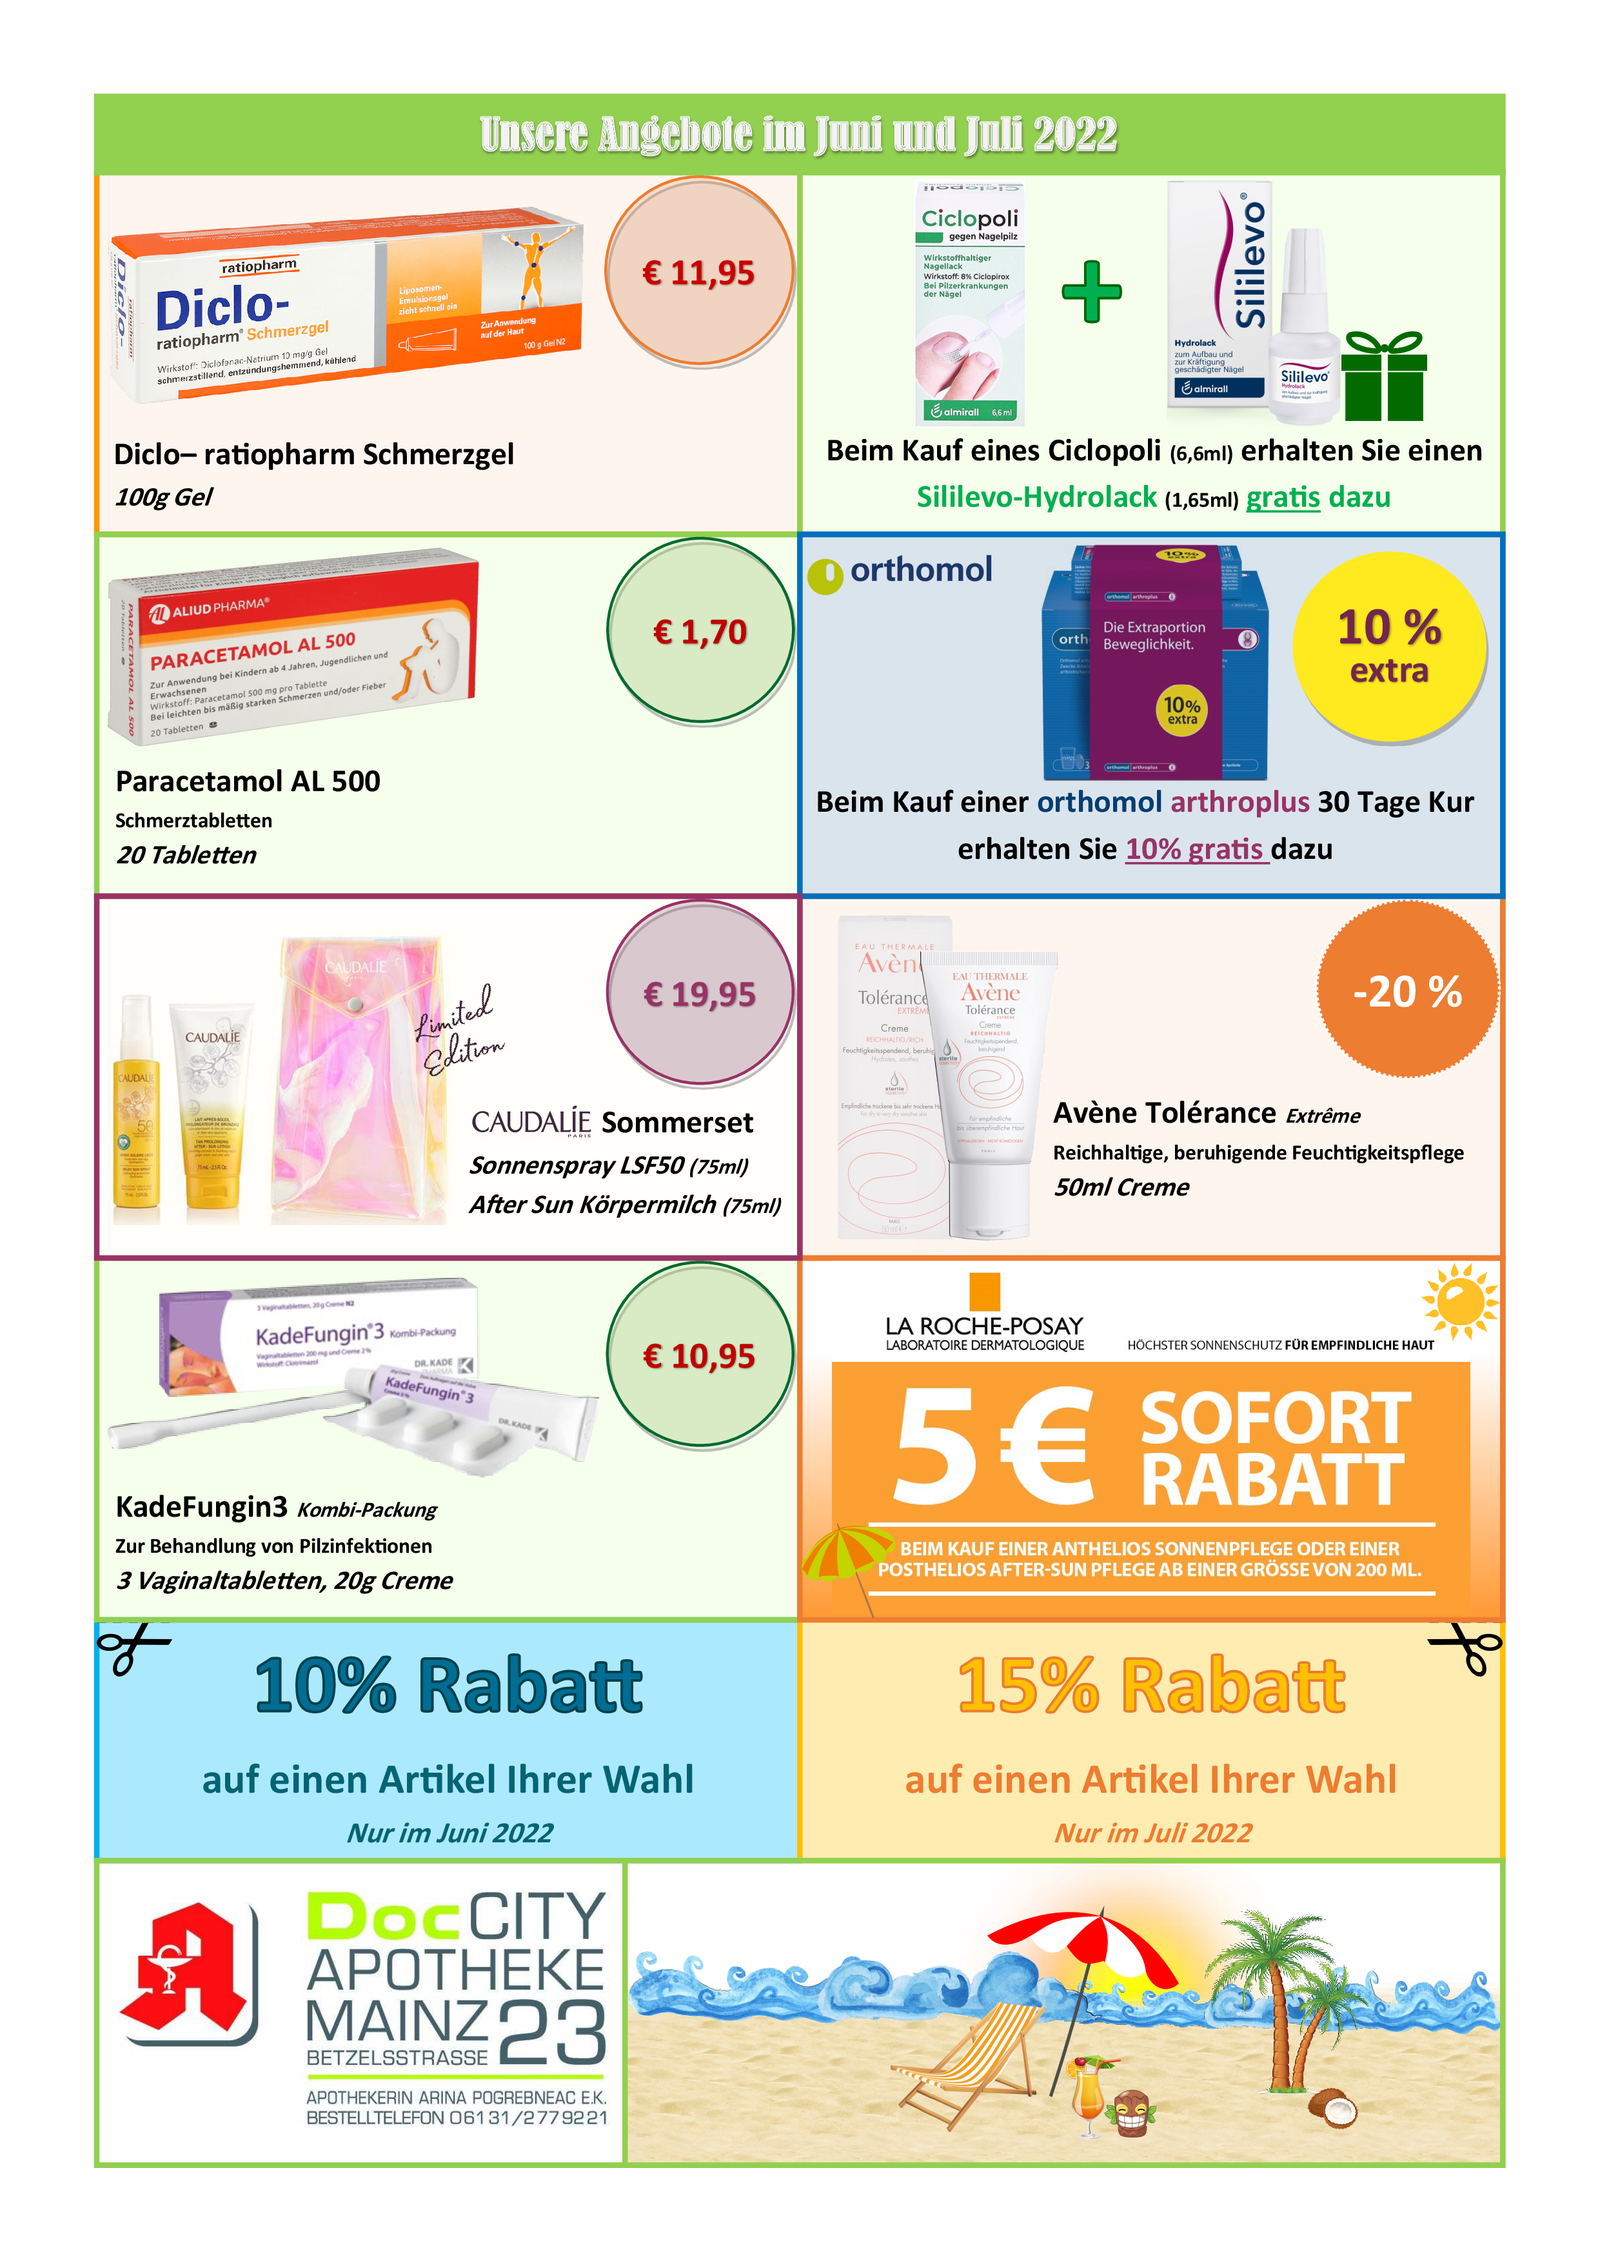 https://mein-uploads.apocdn.net/27267/leaflets/27267_flyer-Seite1.png